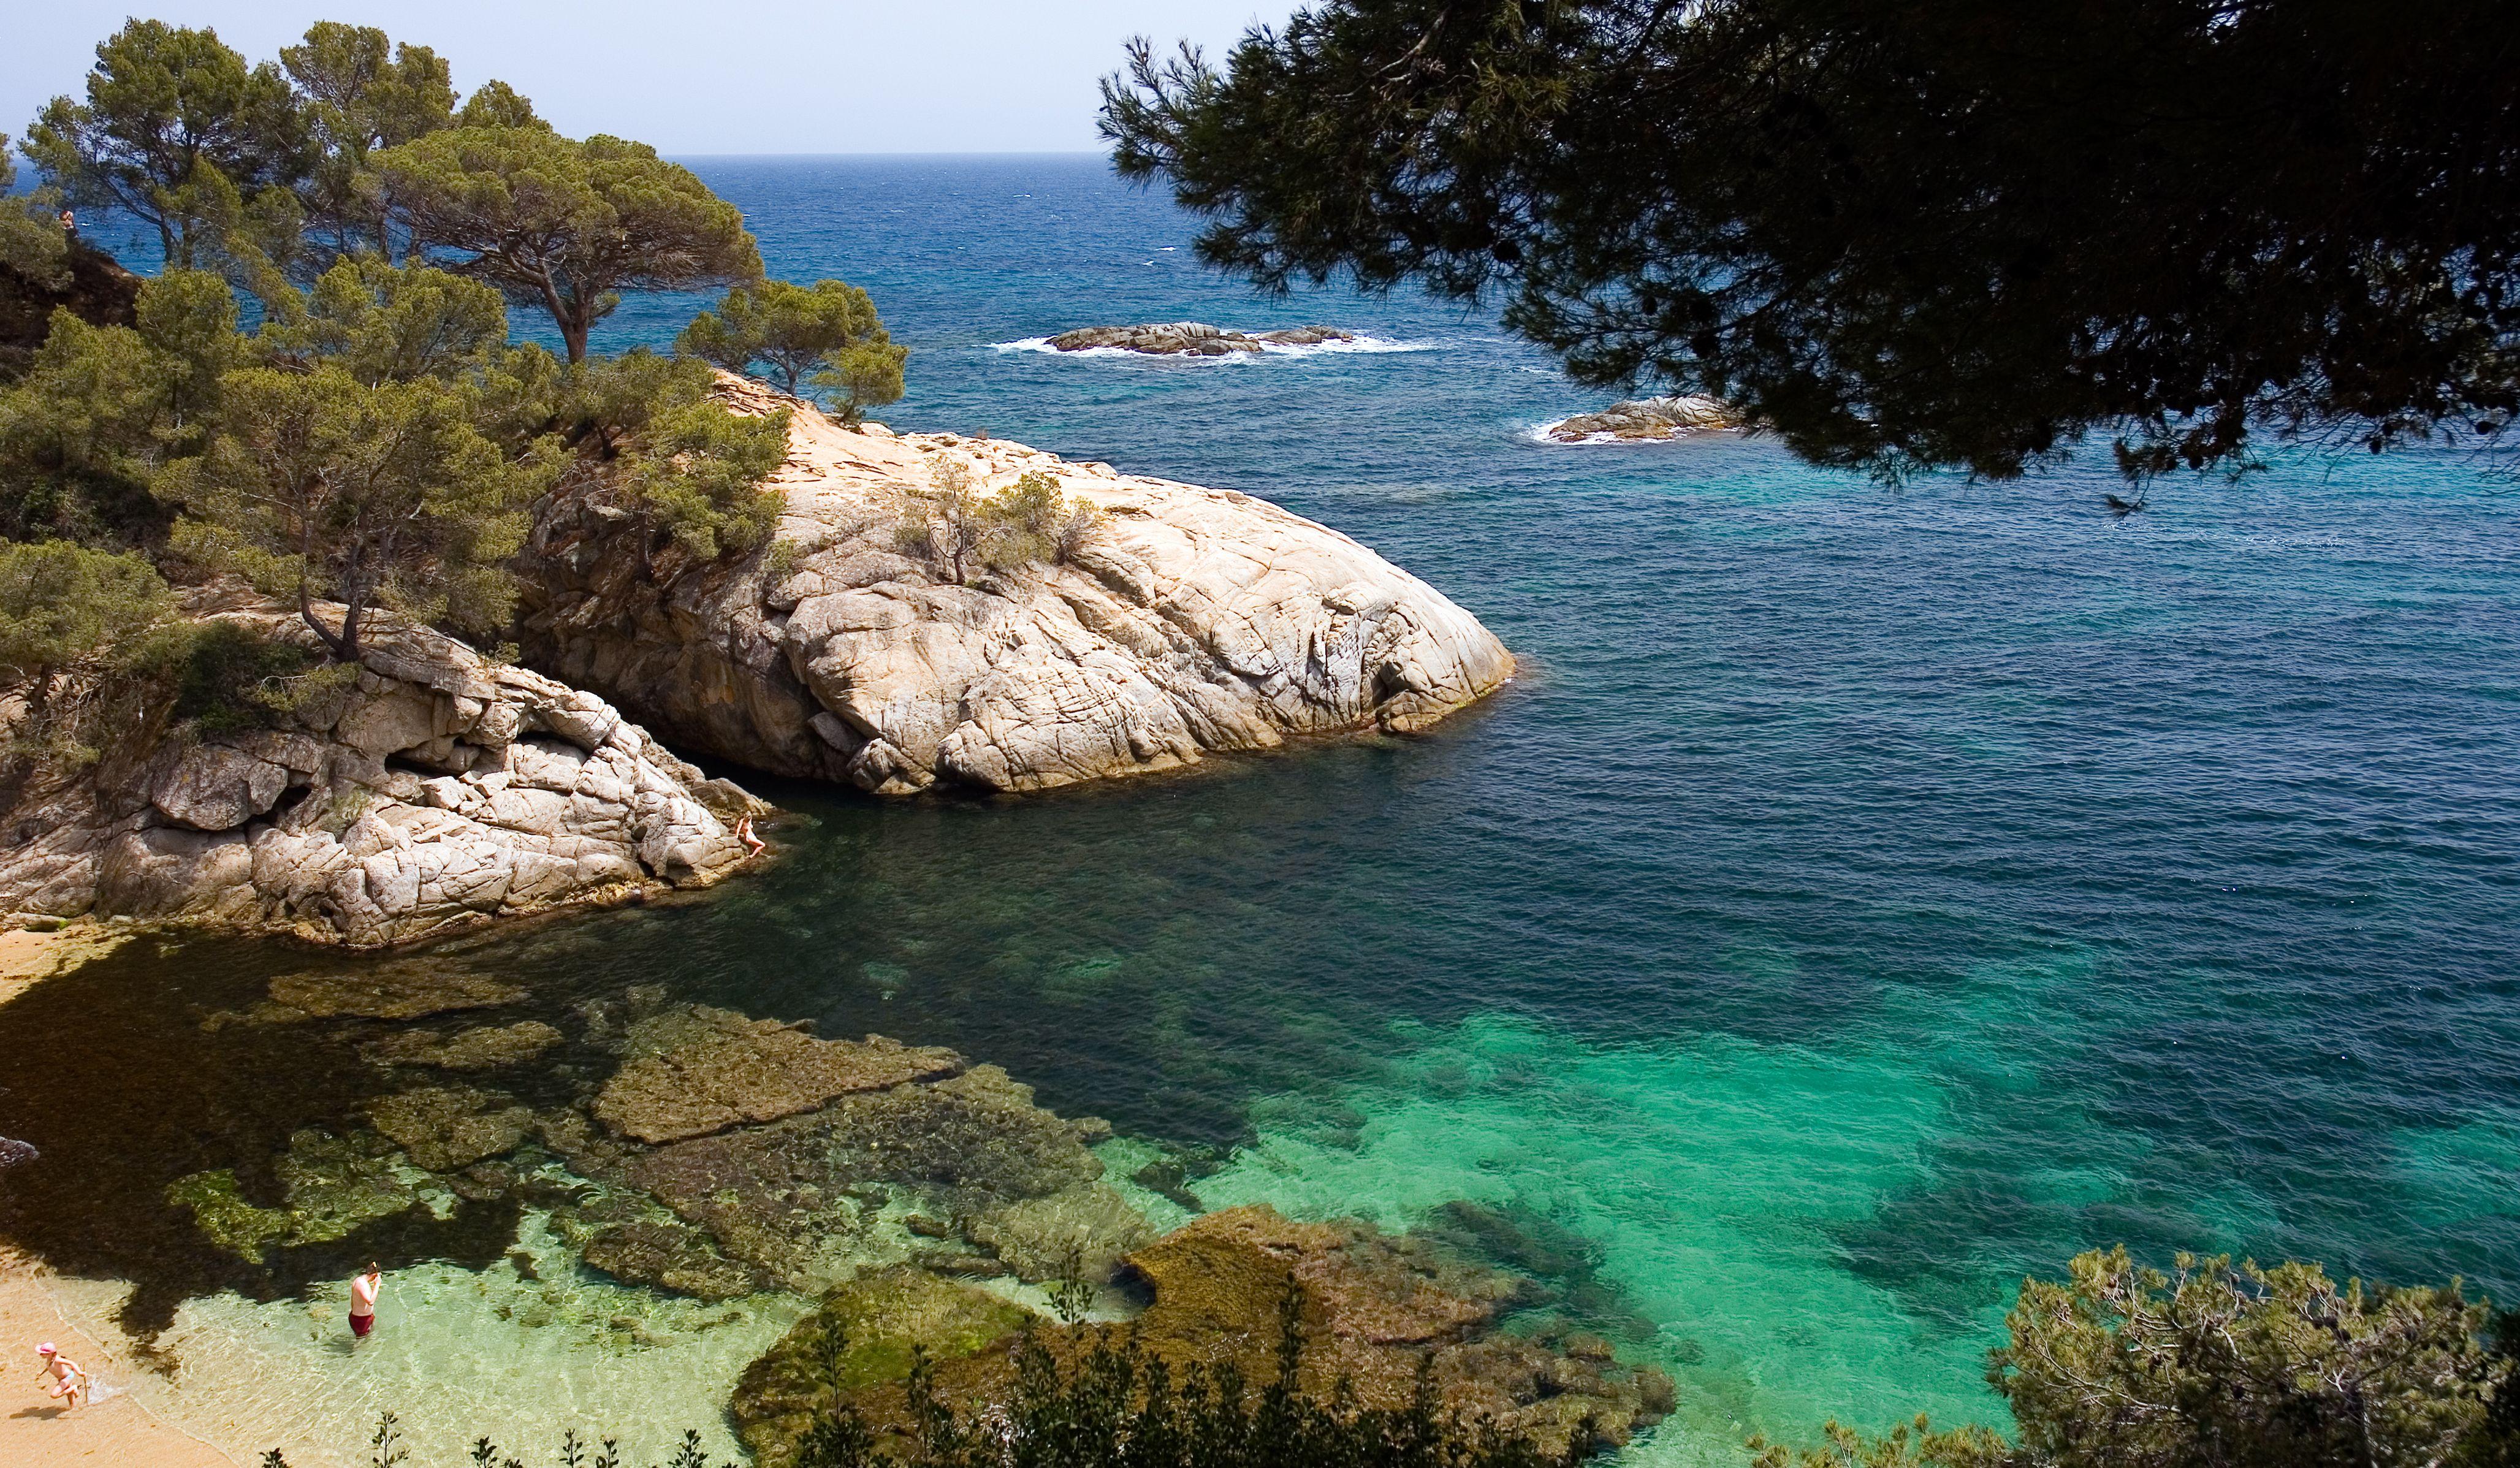 Beaches In Malaga Spain Youandsaturation Costa Brava Malaga Spain Andalusia Spain